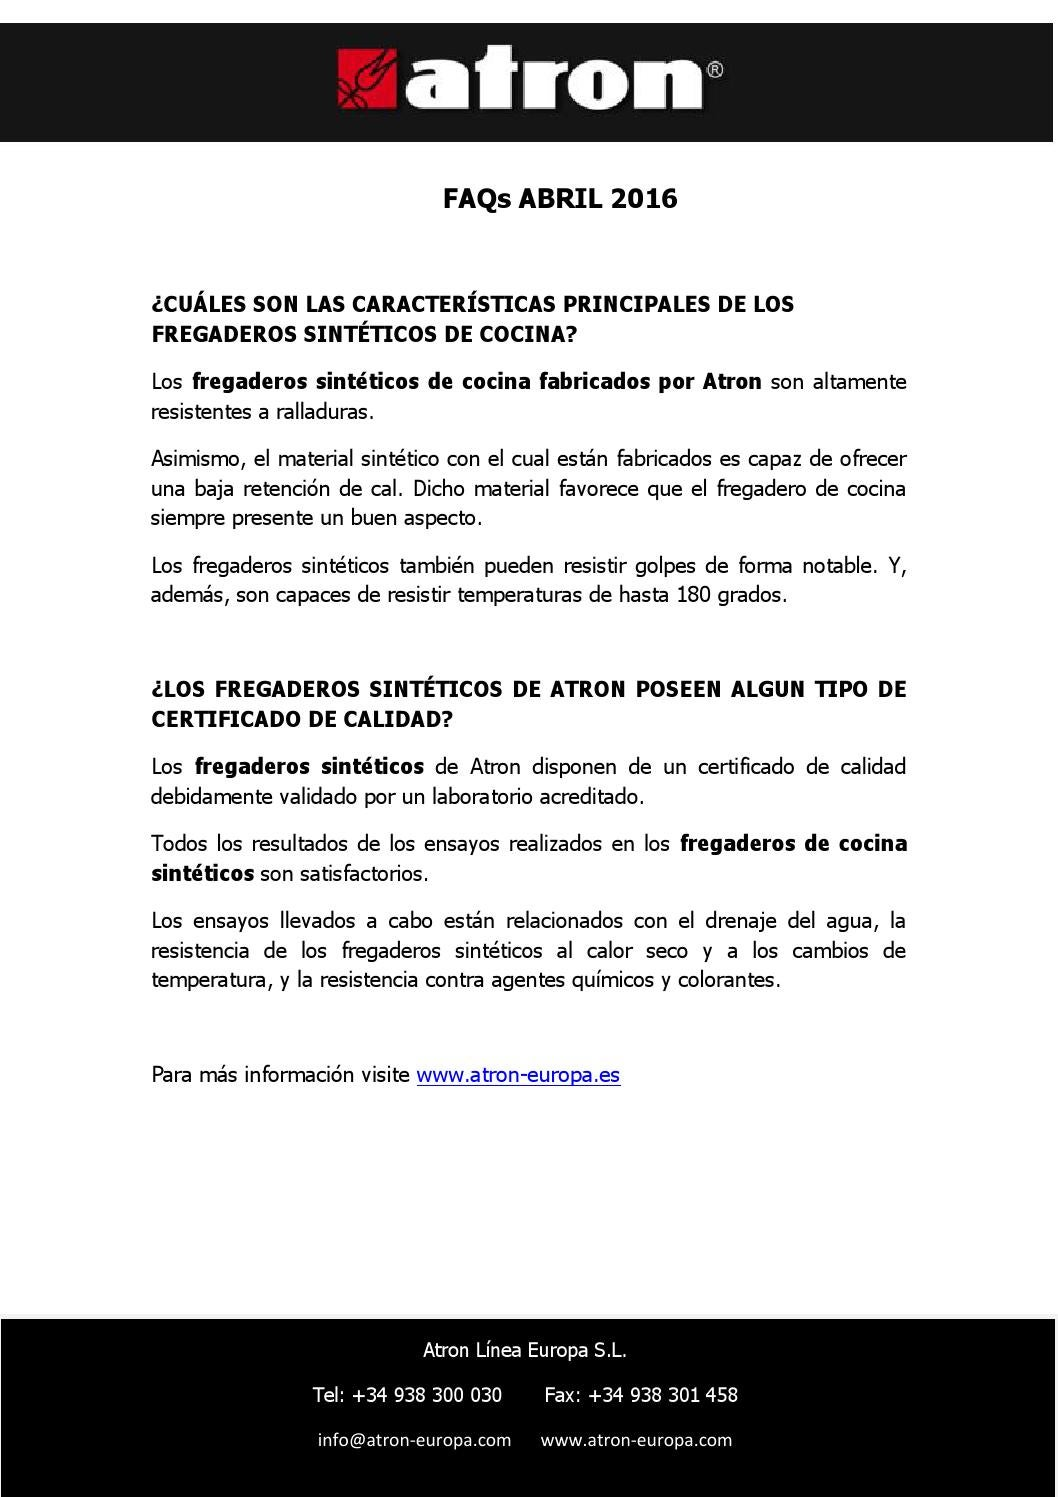 Faqs abril 2016 by atron fregaderos issuu - Fregaderos atron ...